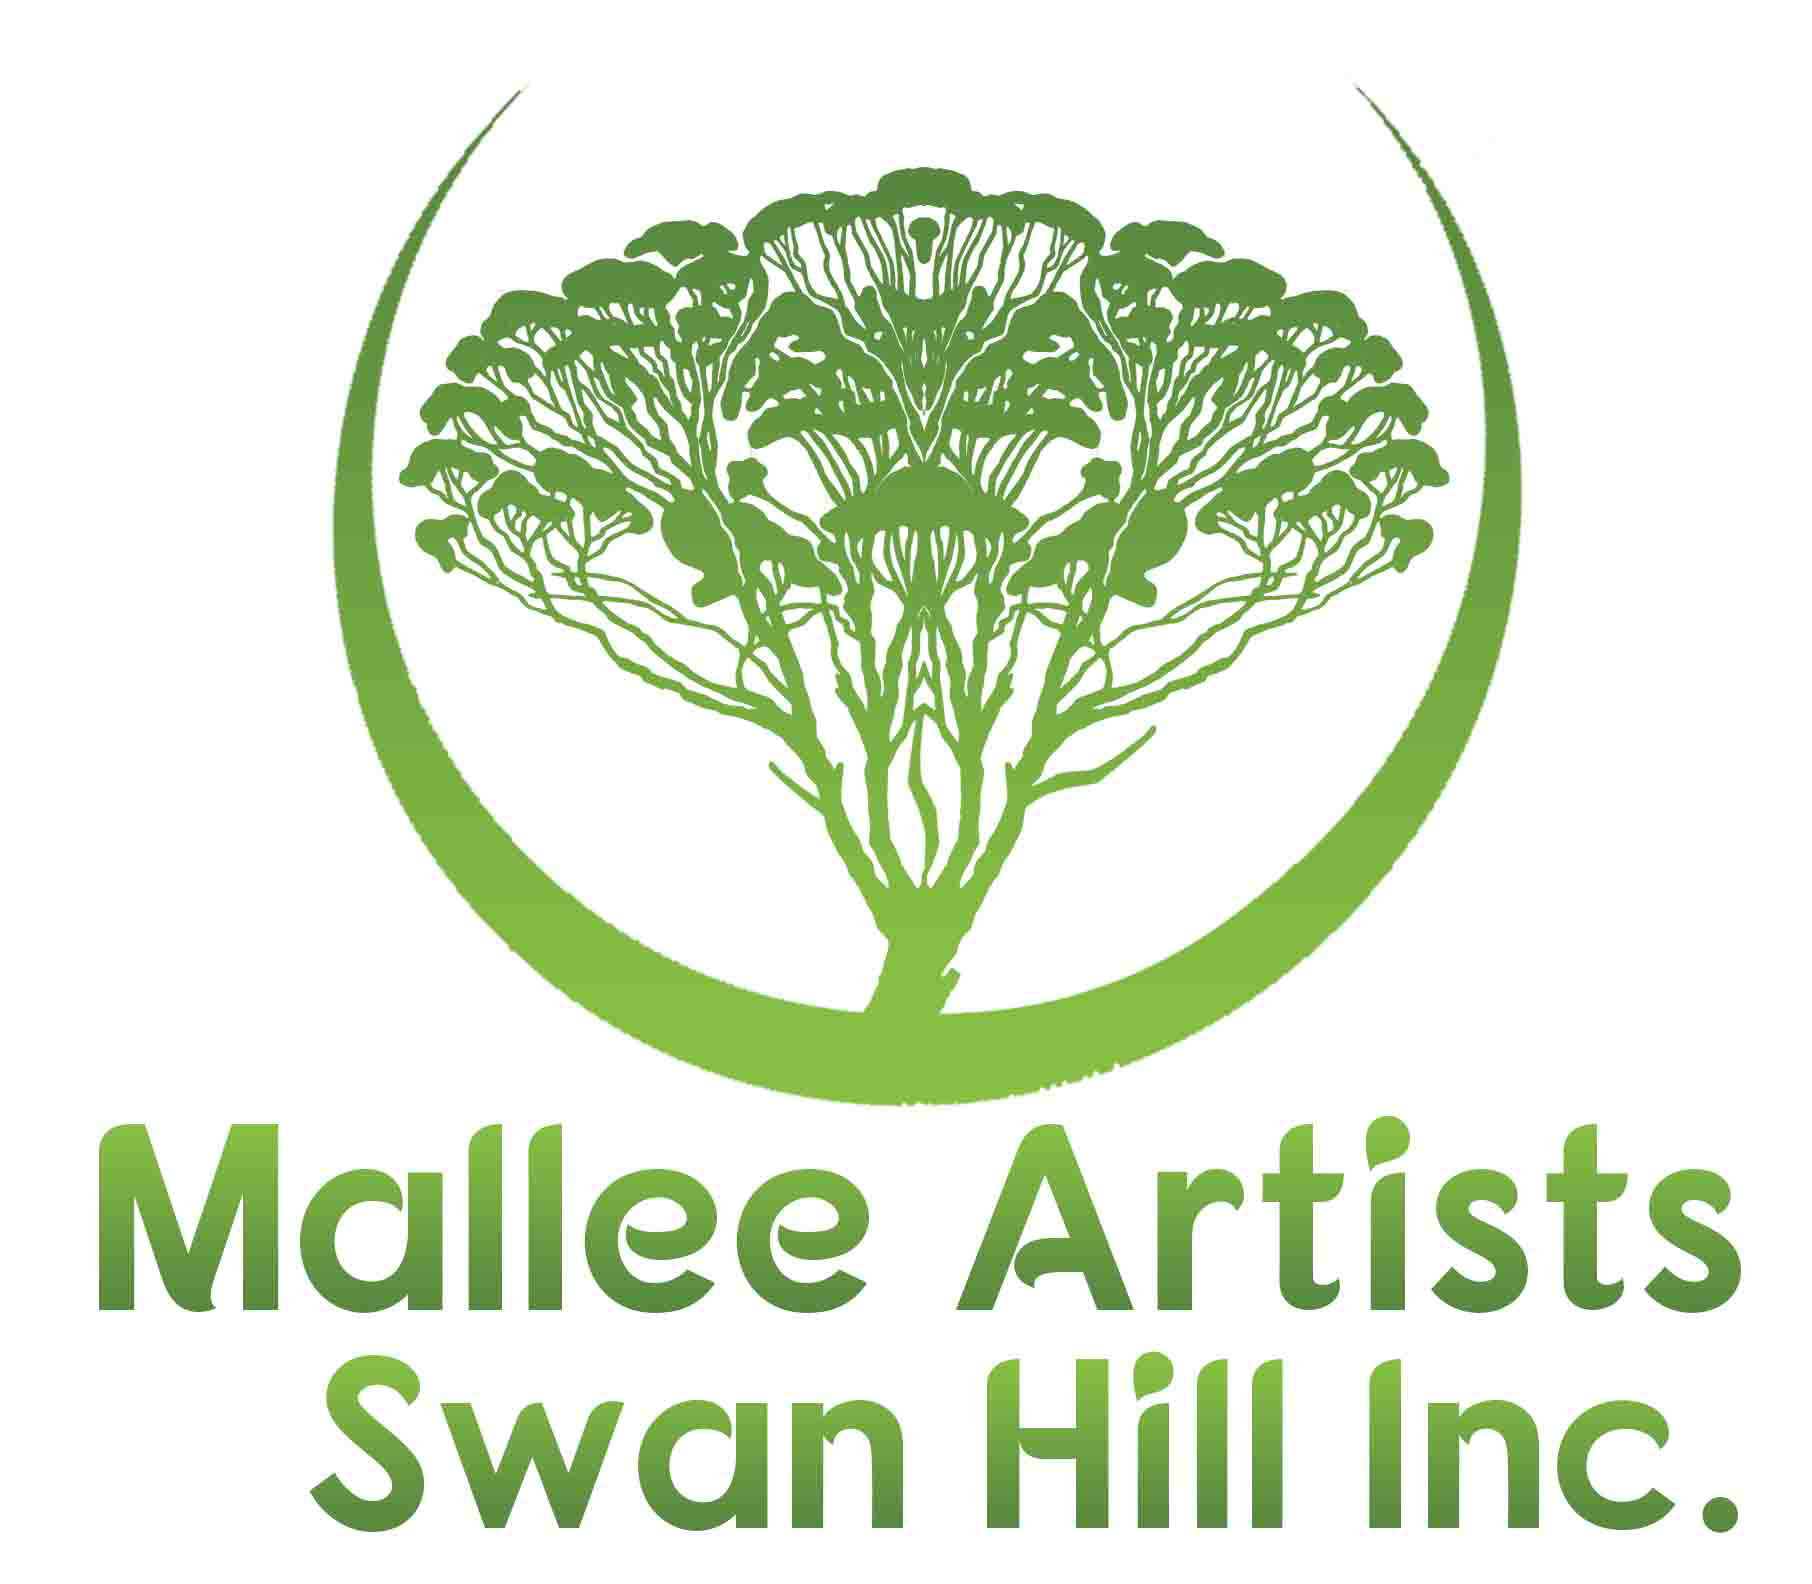 Mallee Artists Swan Hill Inc.